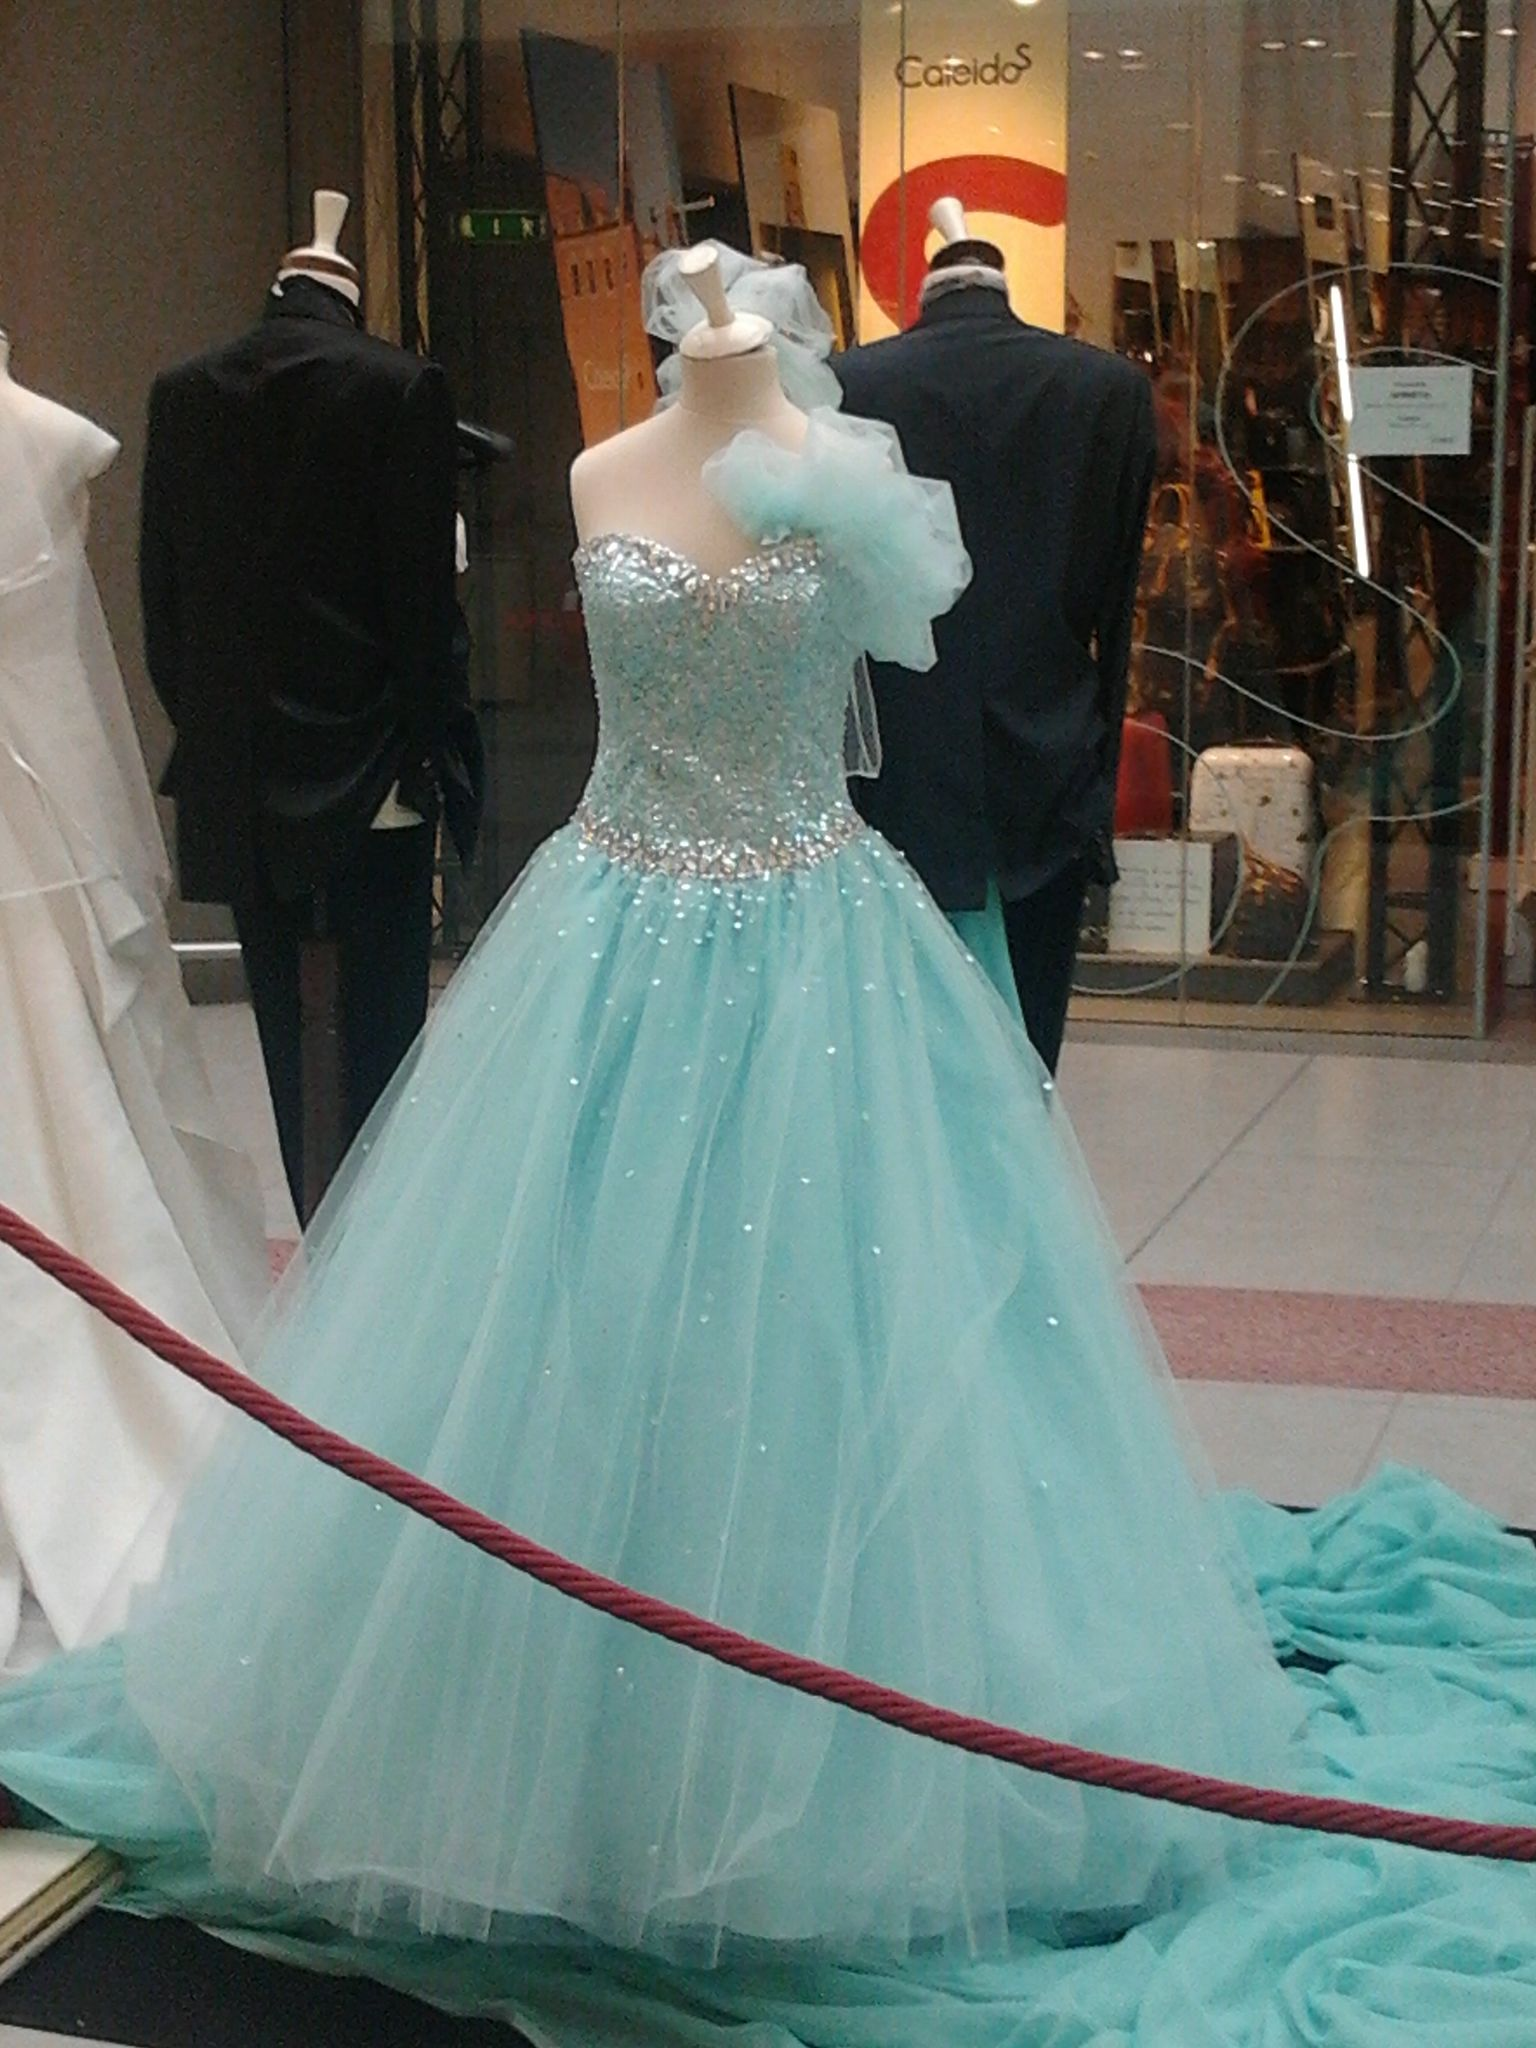 This dress reminds me Cinderella's dress. It's beautiful!!!!